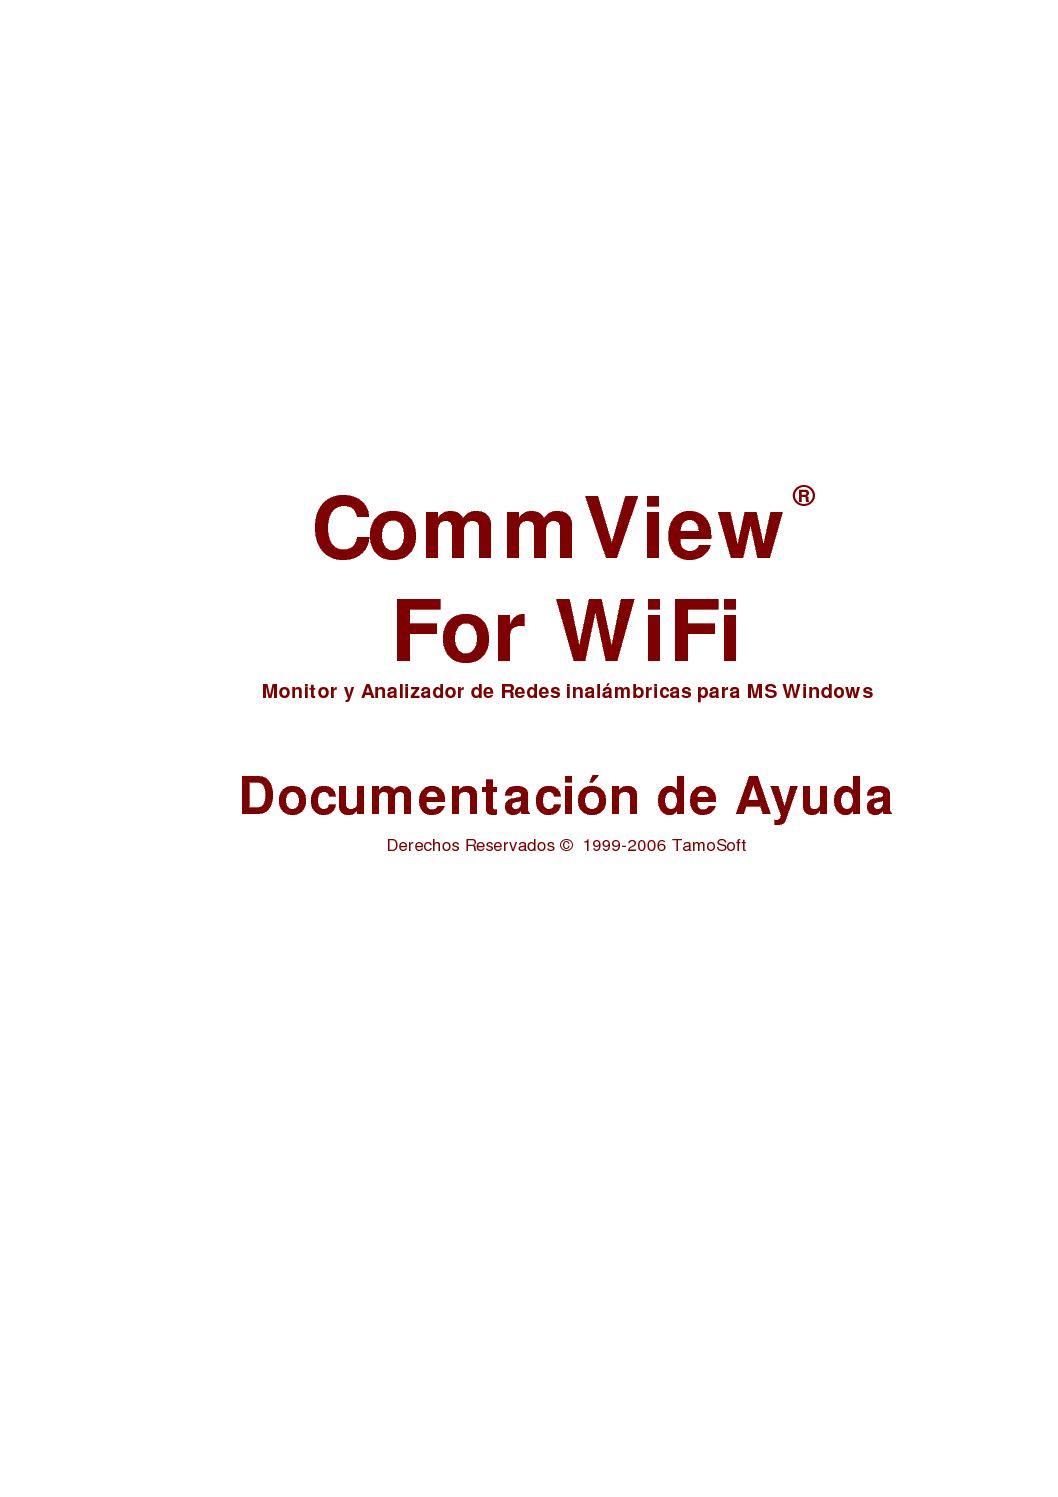 Calaméo - commview